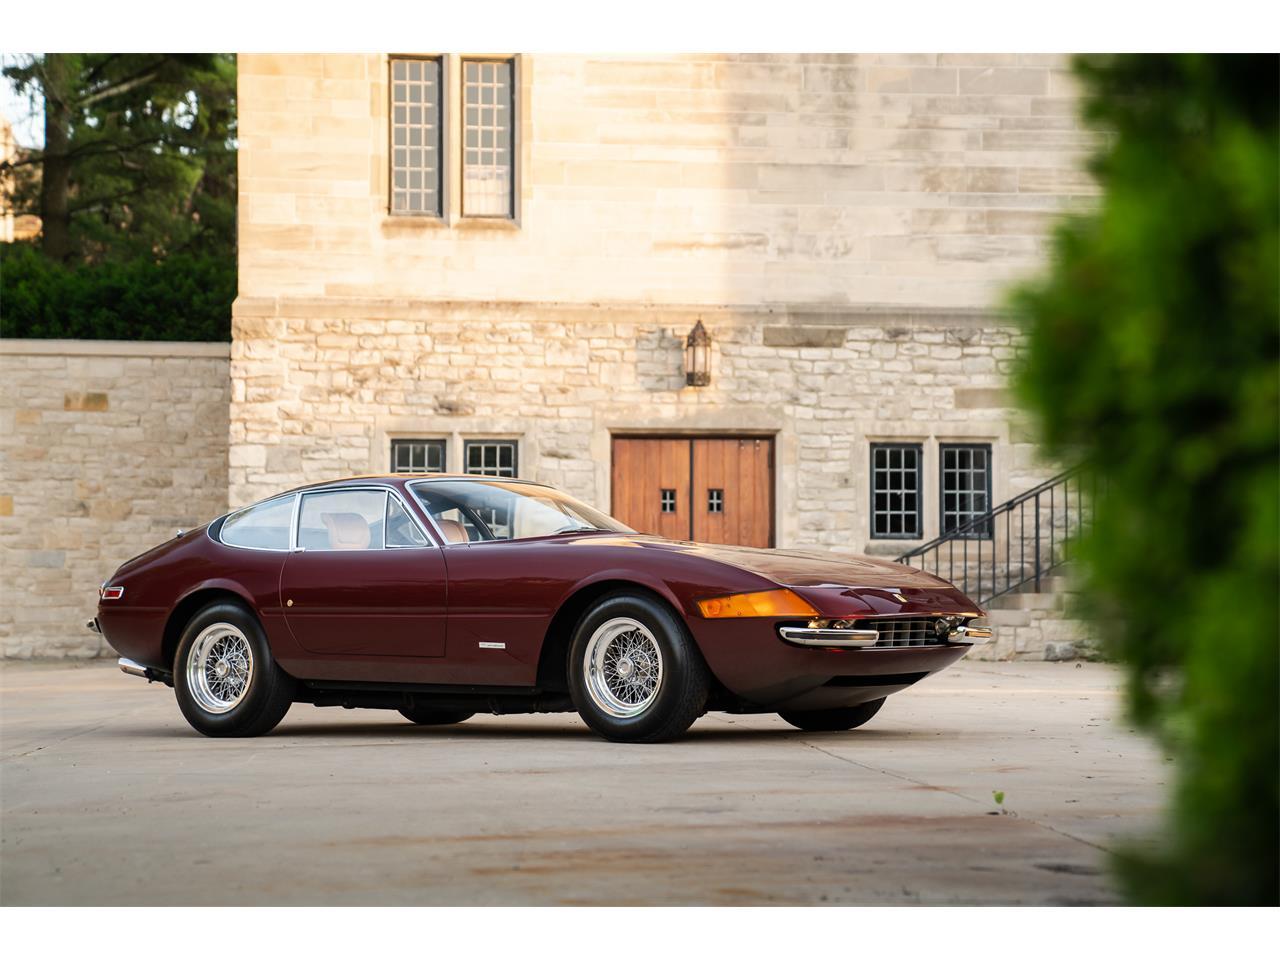 Large Picture of Classic 1972 365 GTB/4 Daytona located in Pontiac Michigan - $725,000.00 - QL32